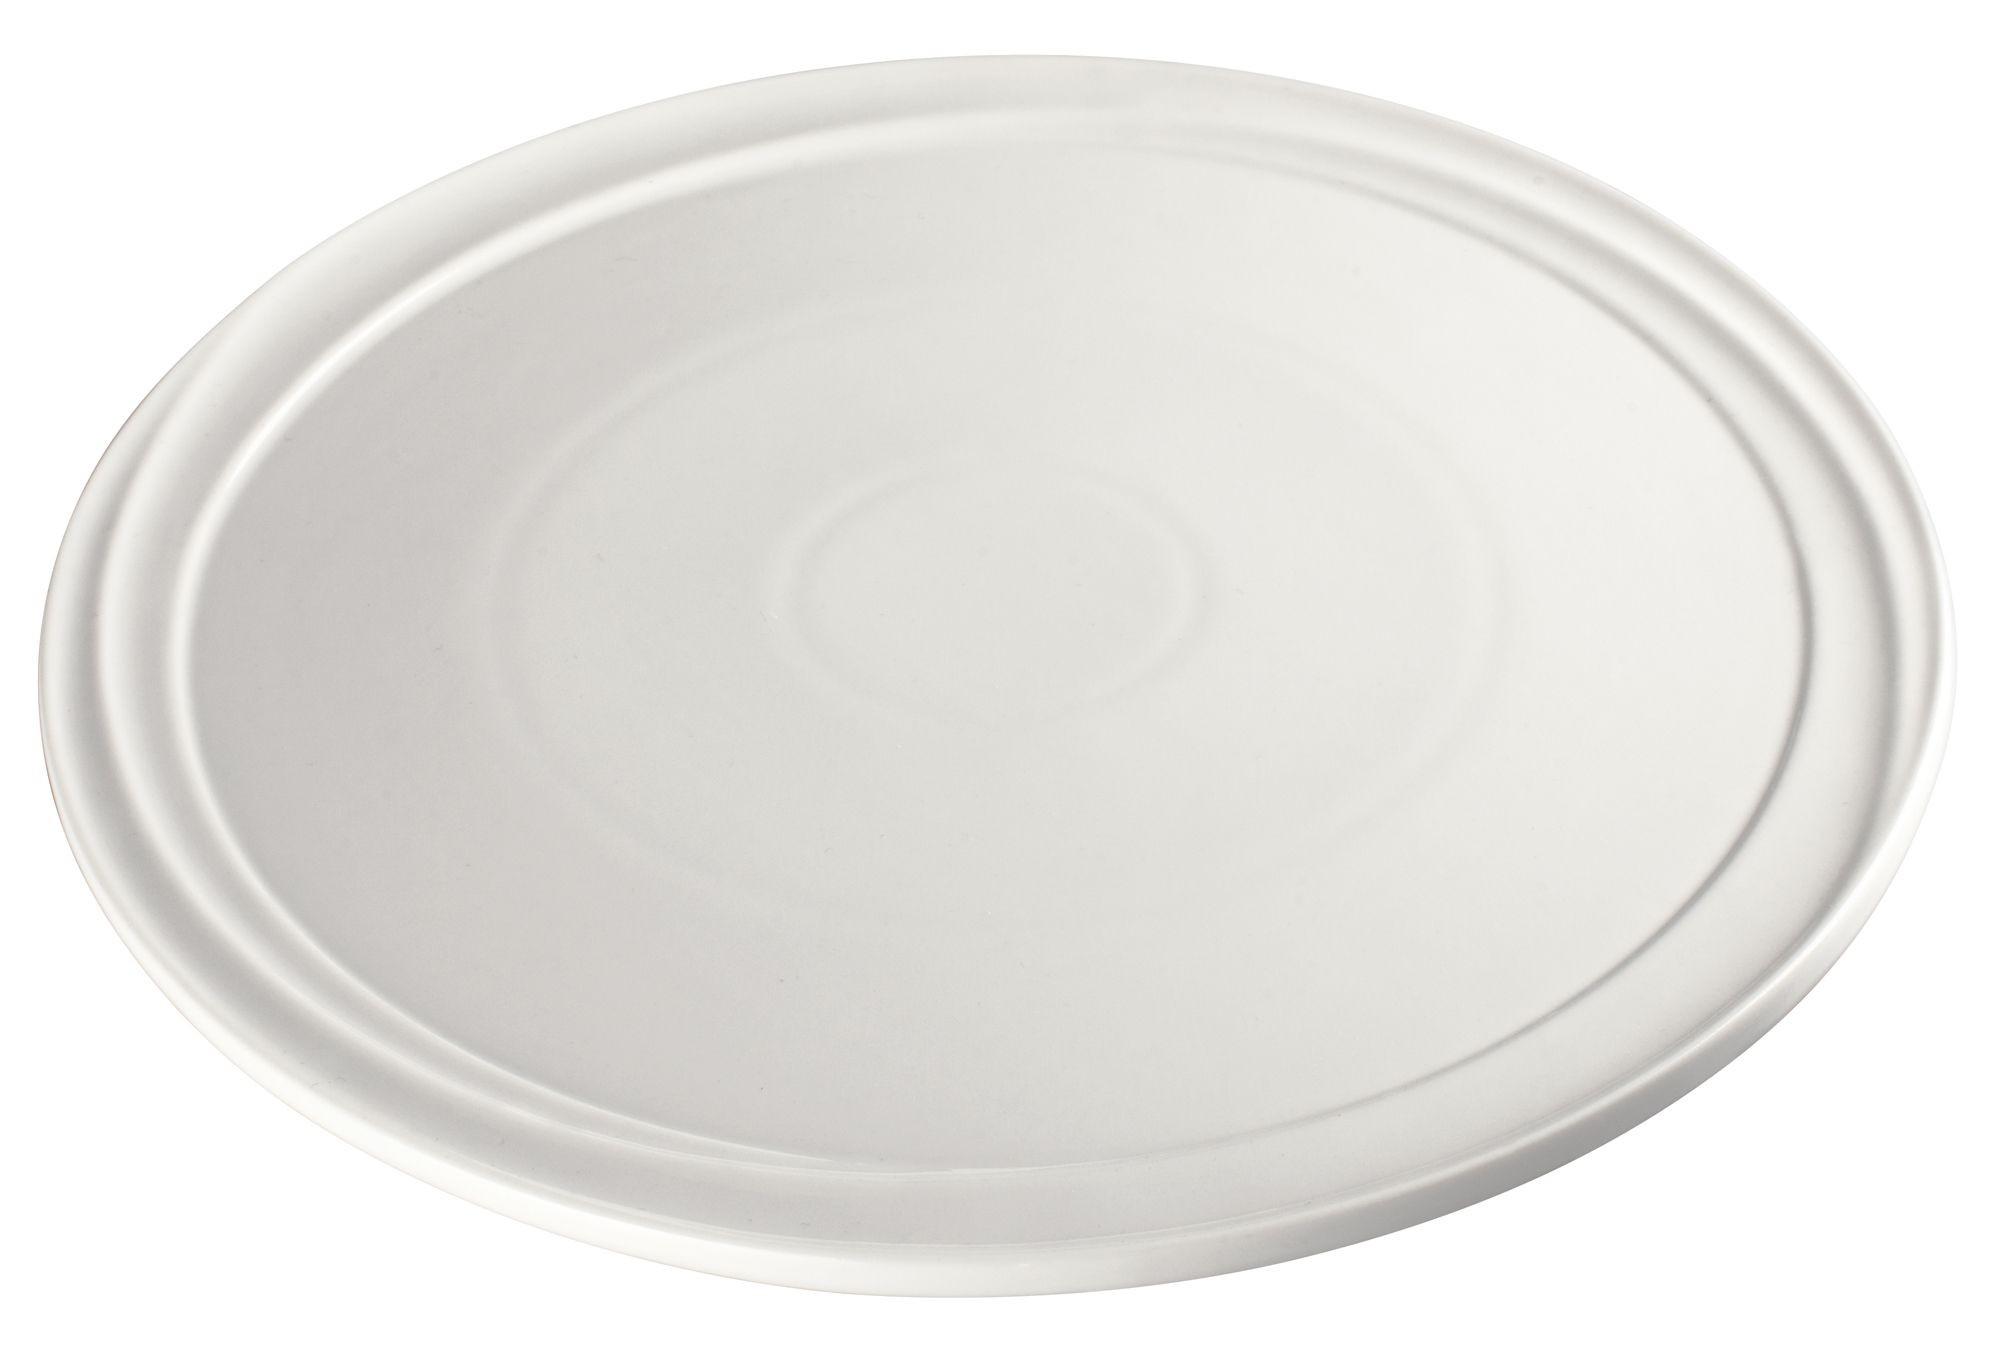 "Winco WDP007-103 Mazzari Creamy White Porcelain Round Platter 12"""